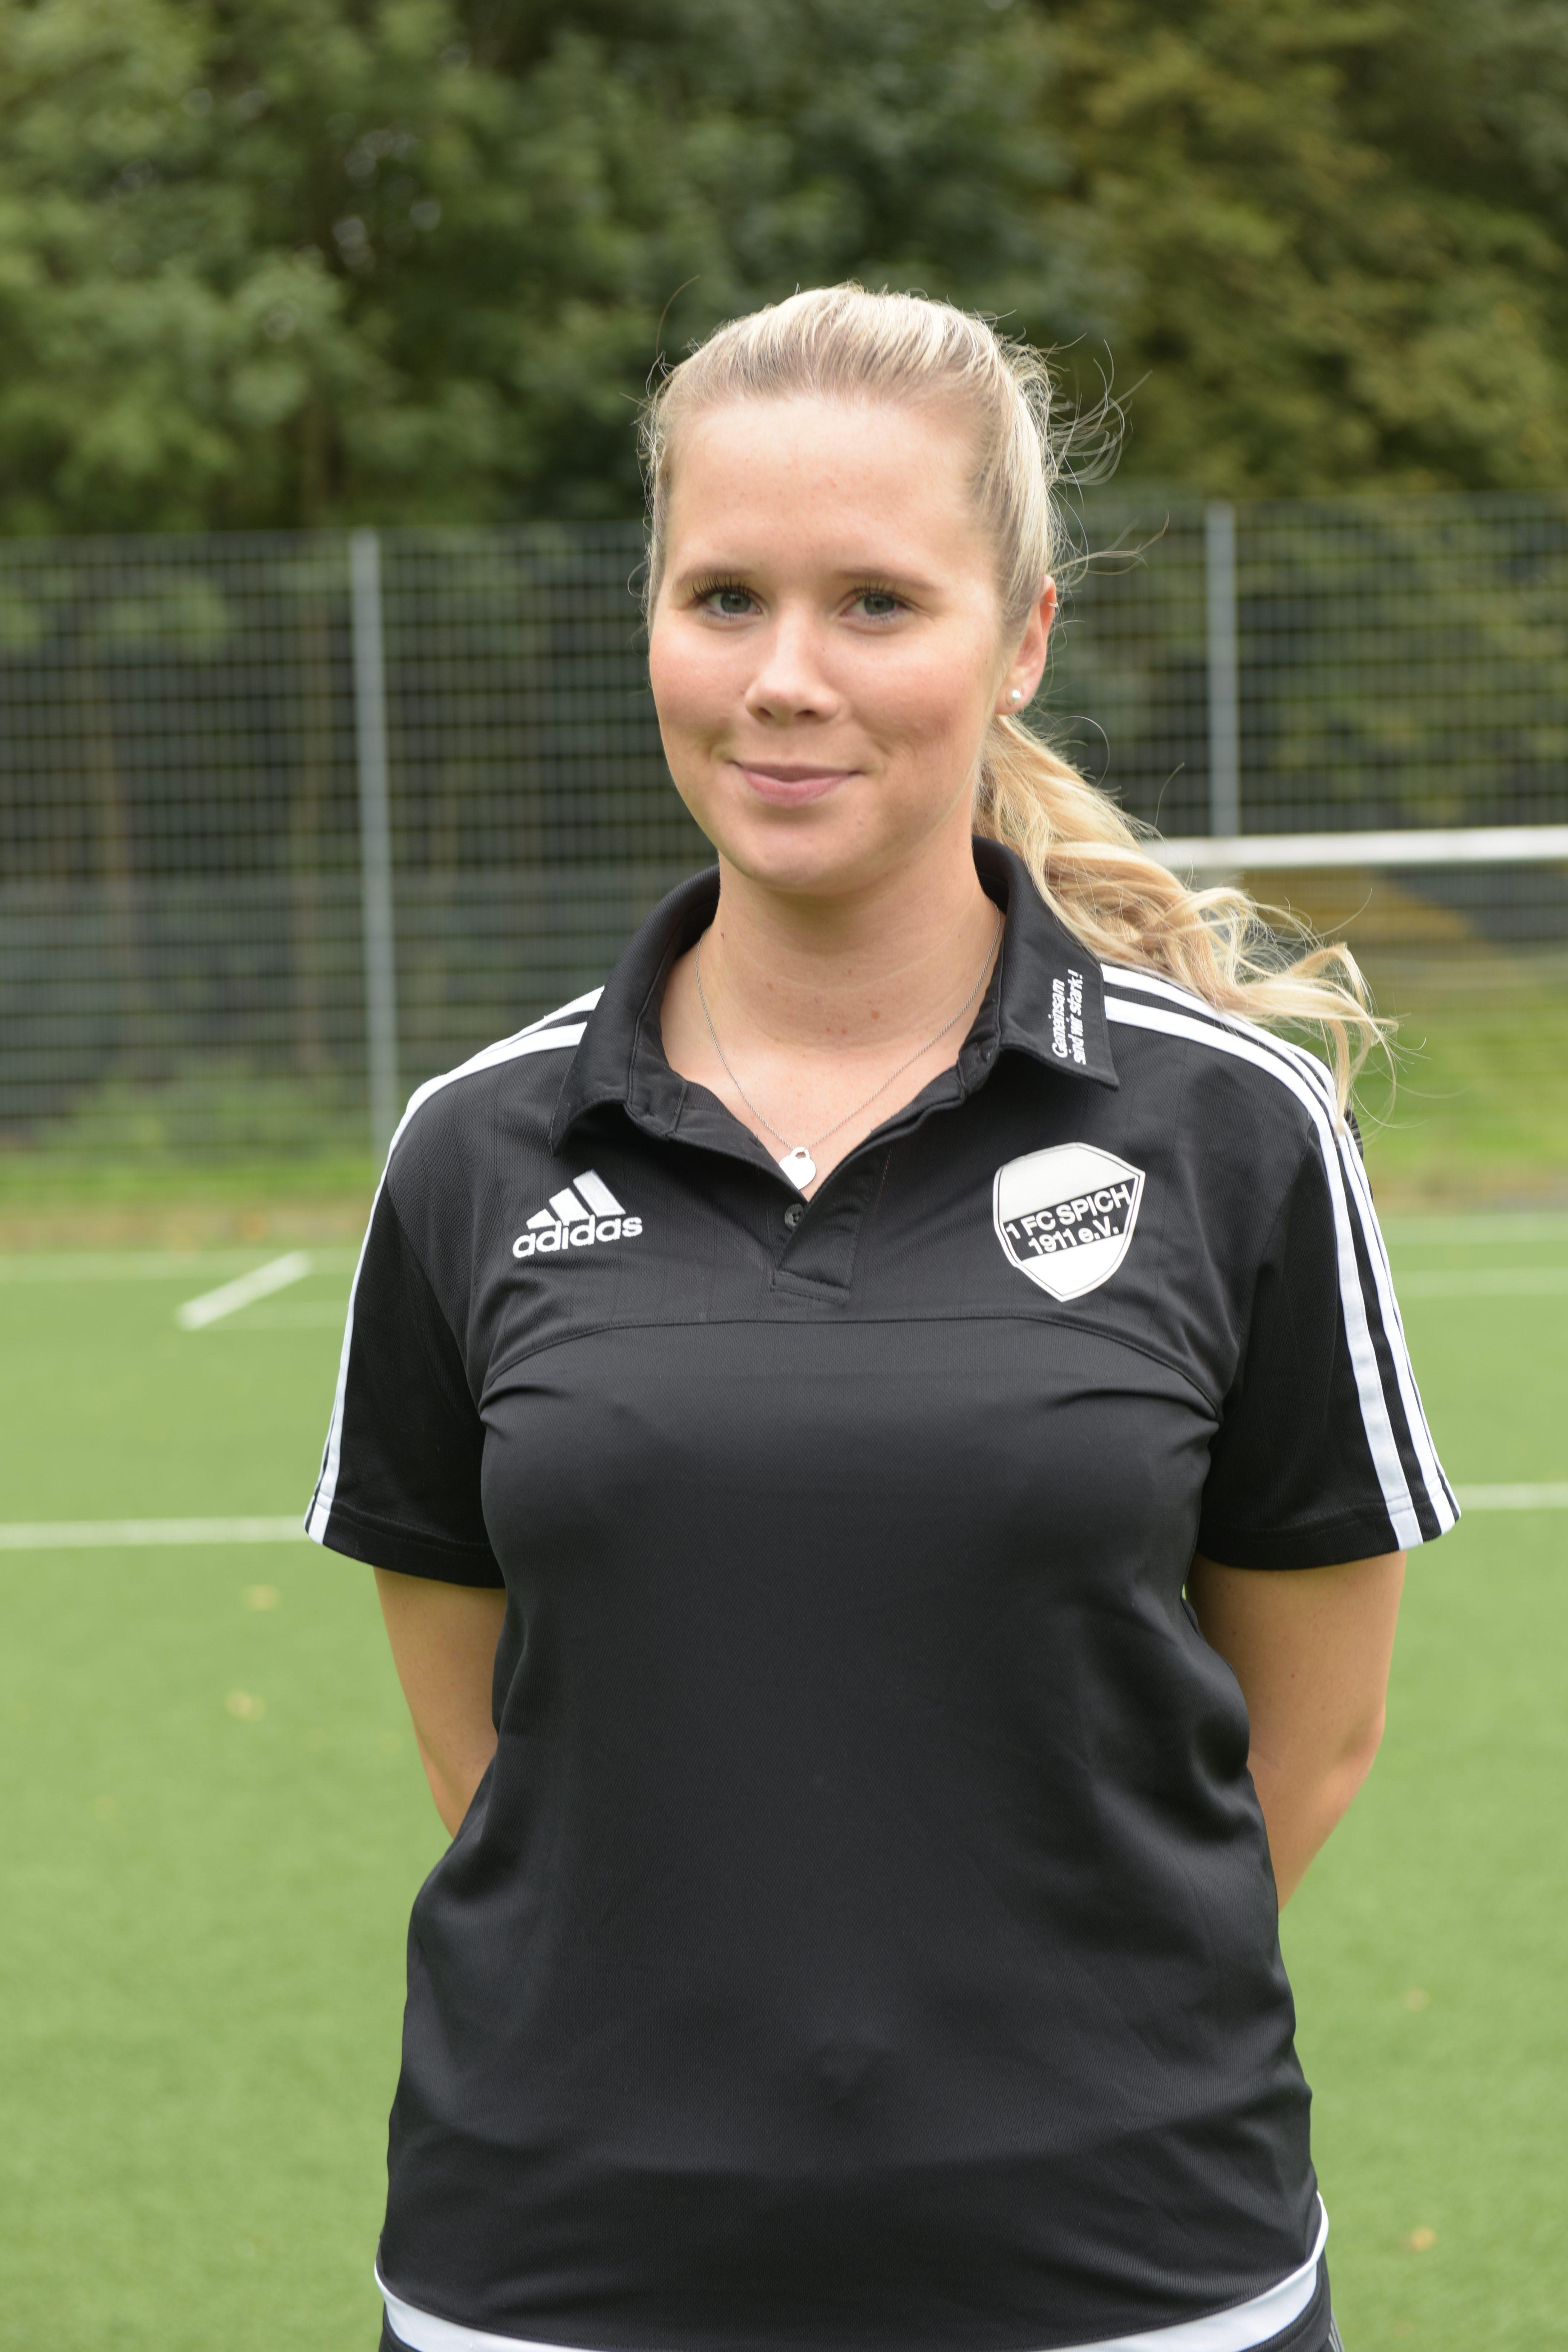 Kristina Saupper